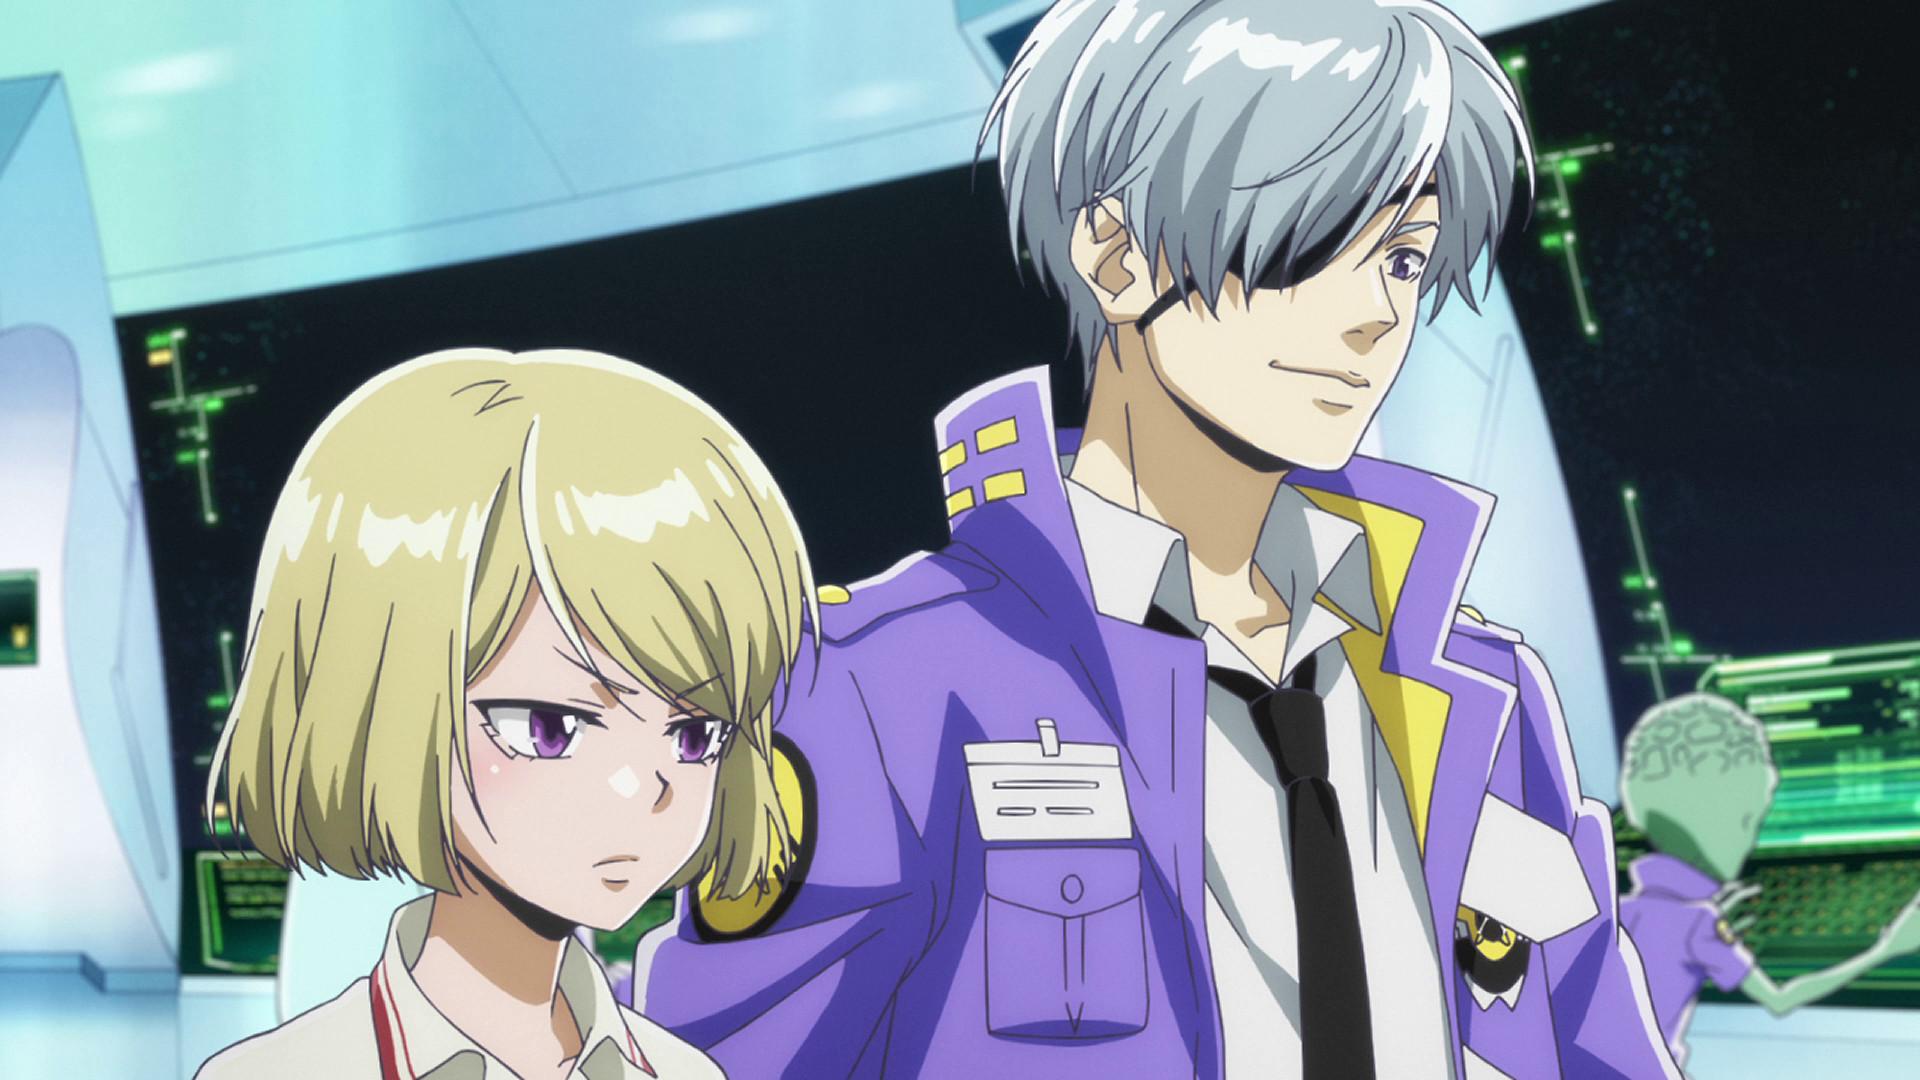 Watch elDLIVE Season 1 Episode 2 Anime Uncut on Funimation